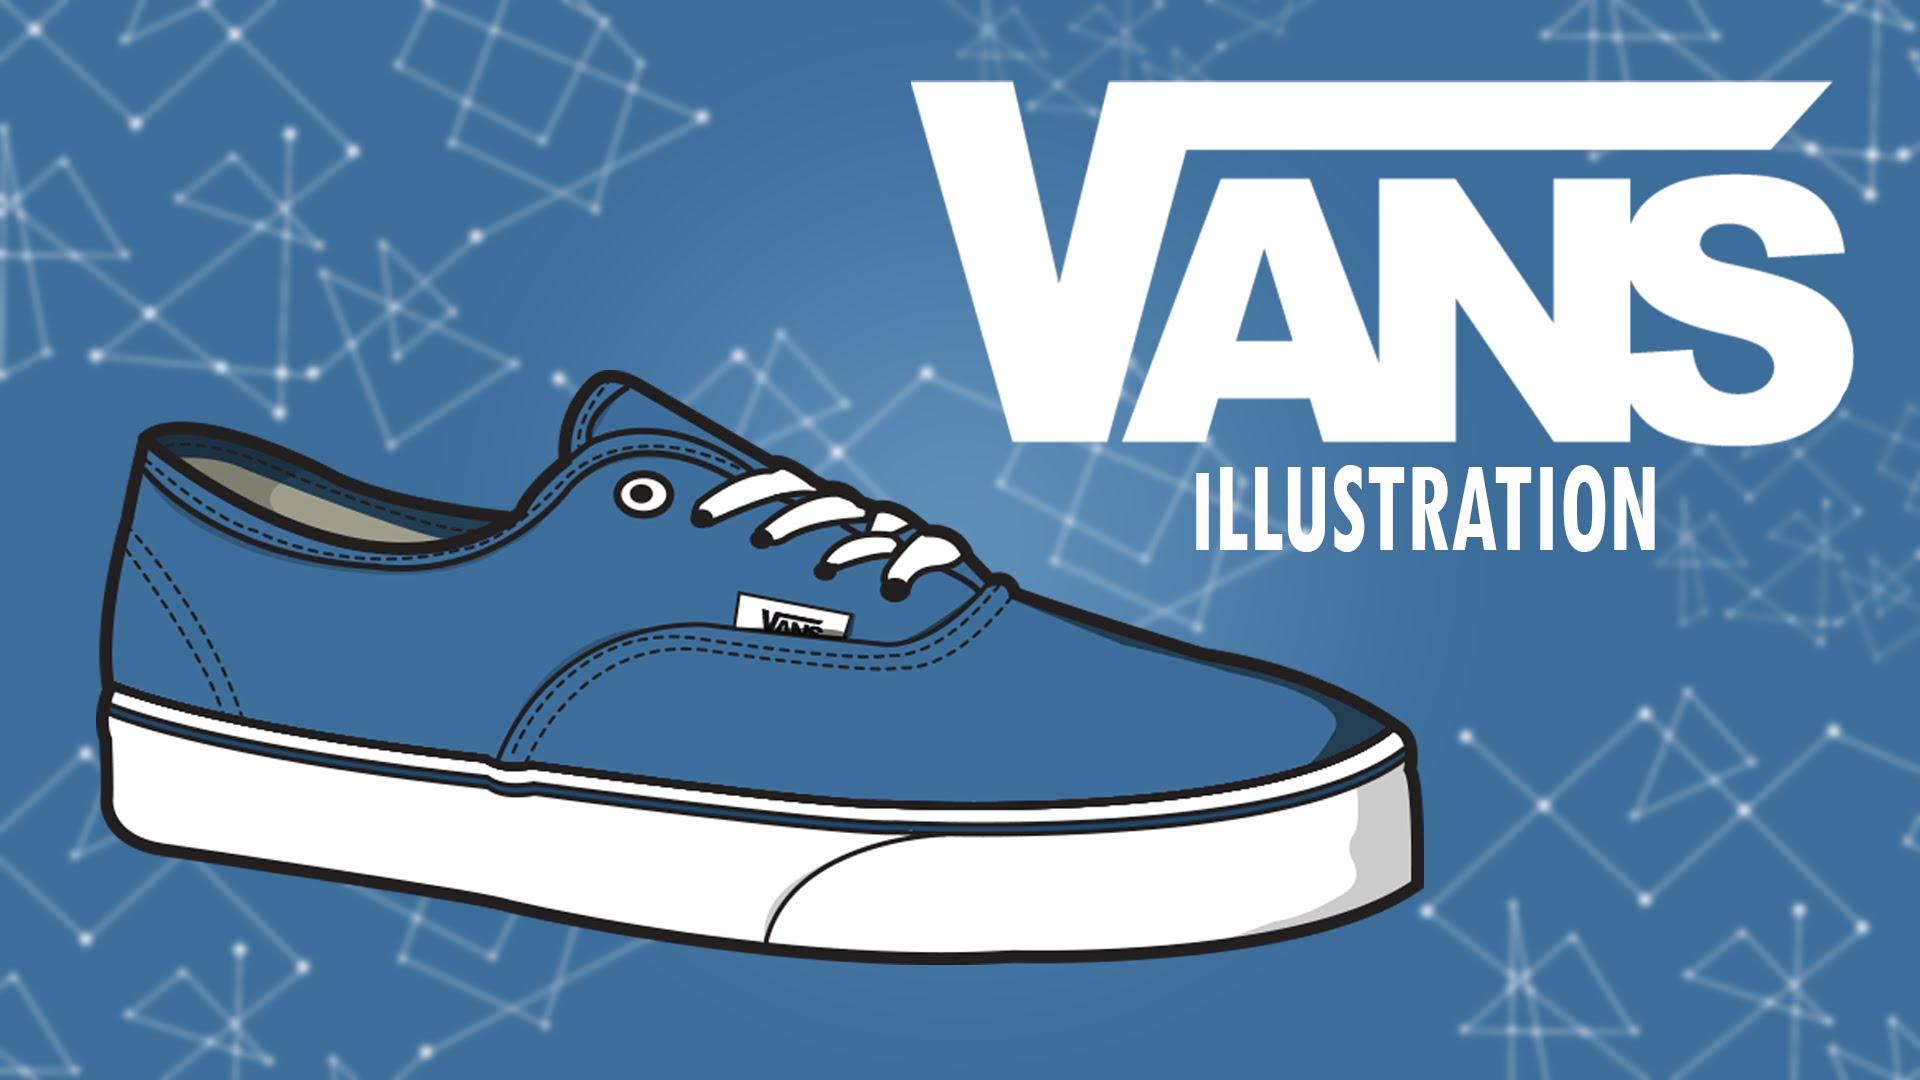 f56920b10bd5 Hd Hd Pixelstalknet Wallpaper Vans Shoes Shoes 13 0Epwqw